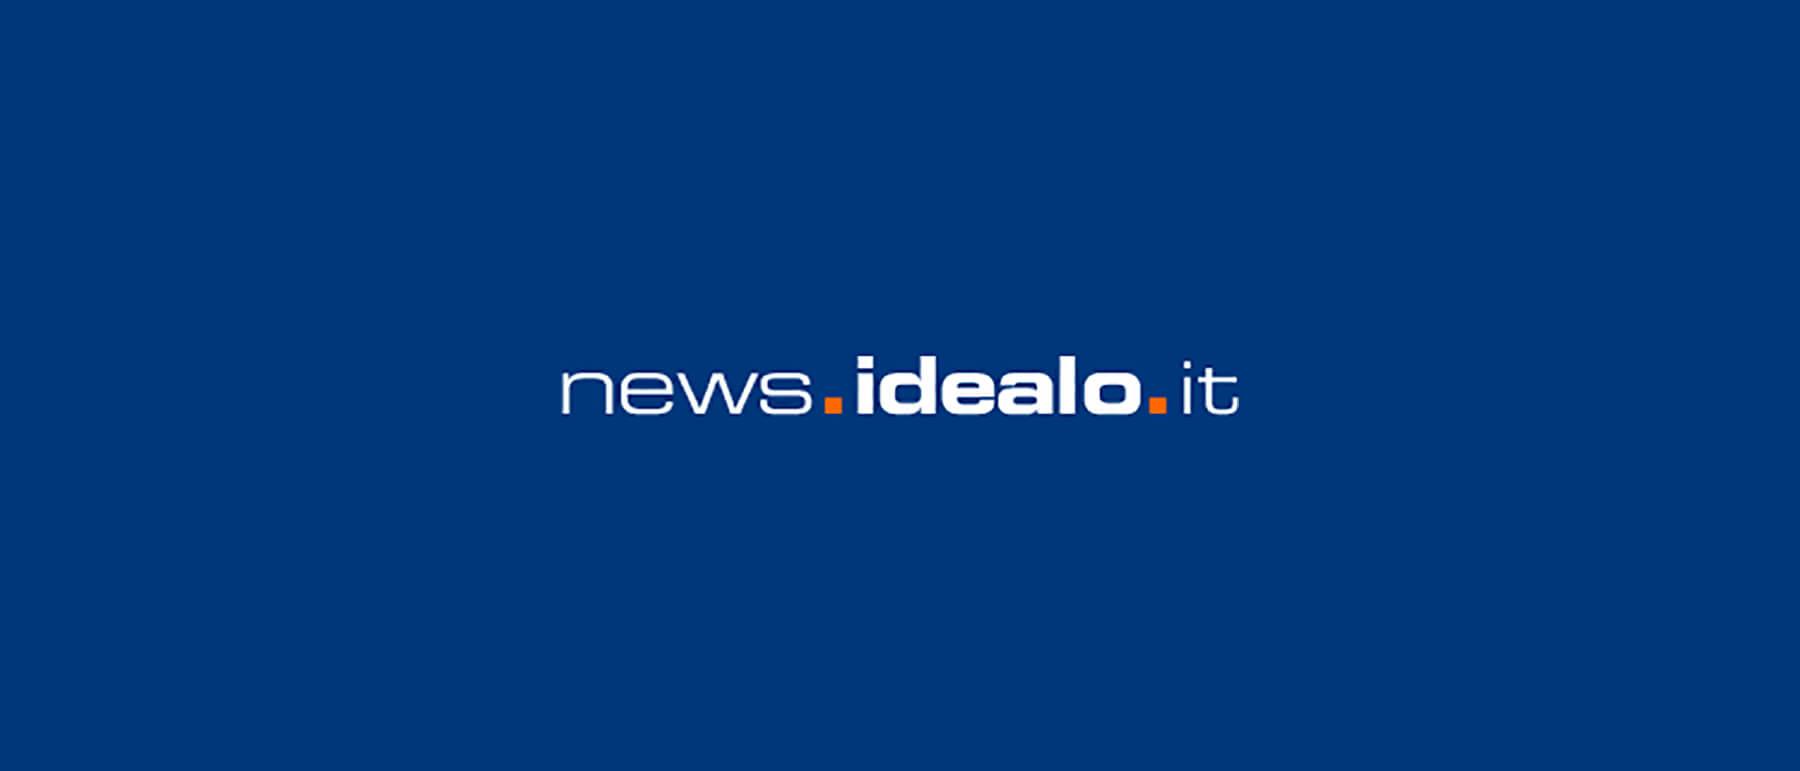 news.idealo.it